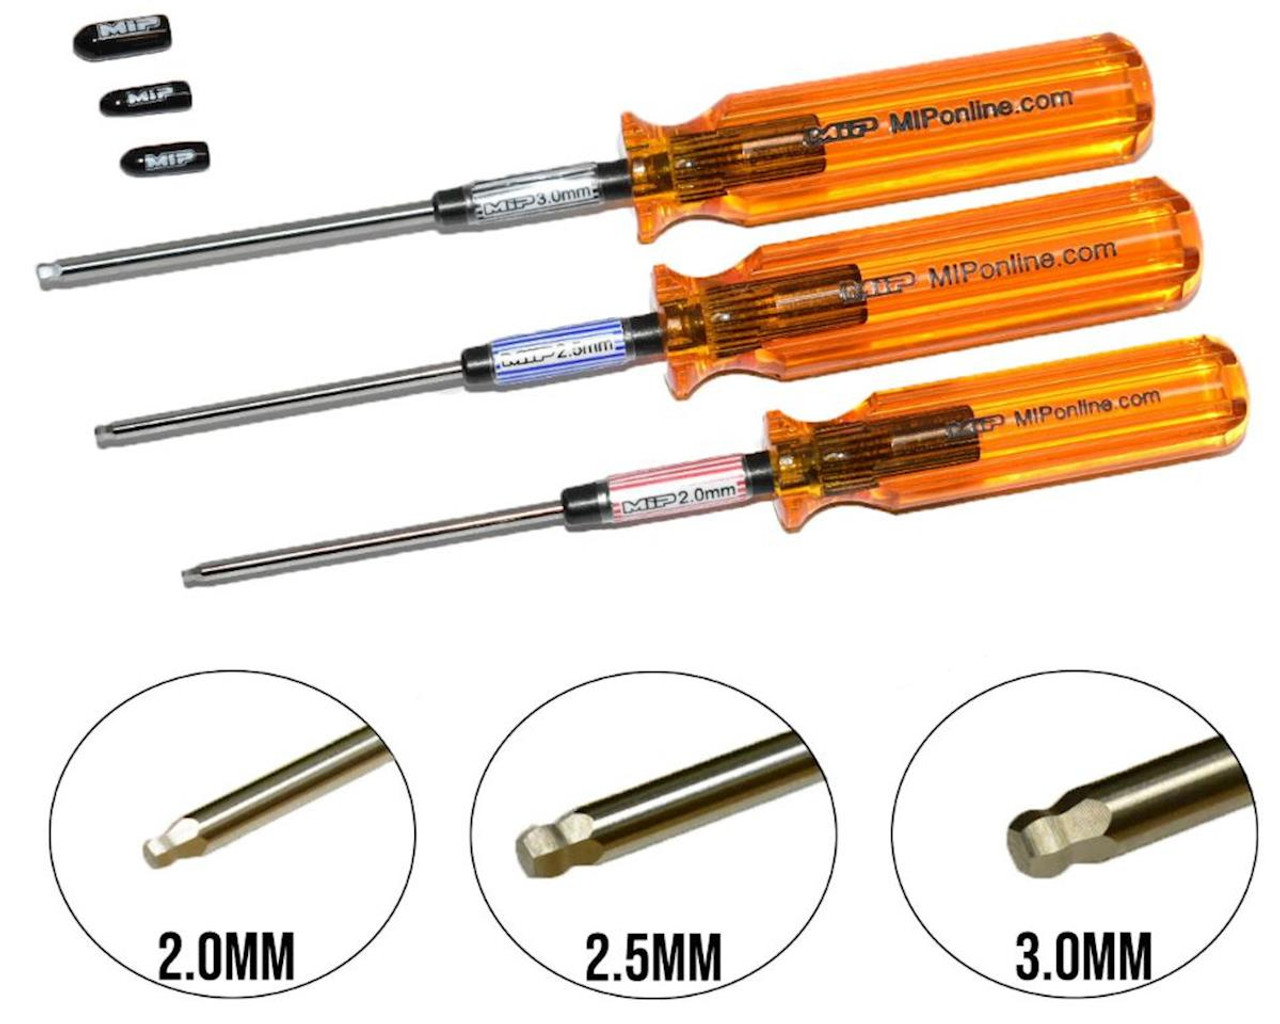 MIP Hex Driver Ball Wrench Set, Metric, 2.0/2.5/3.0mm, 3pcs